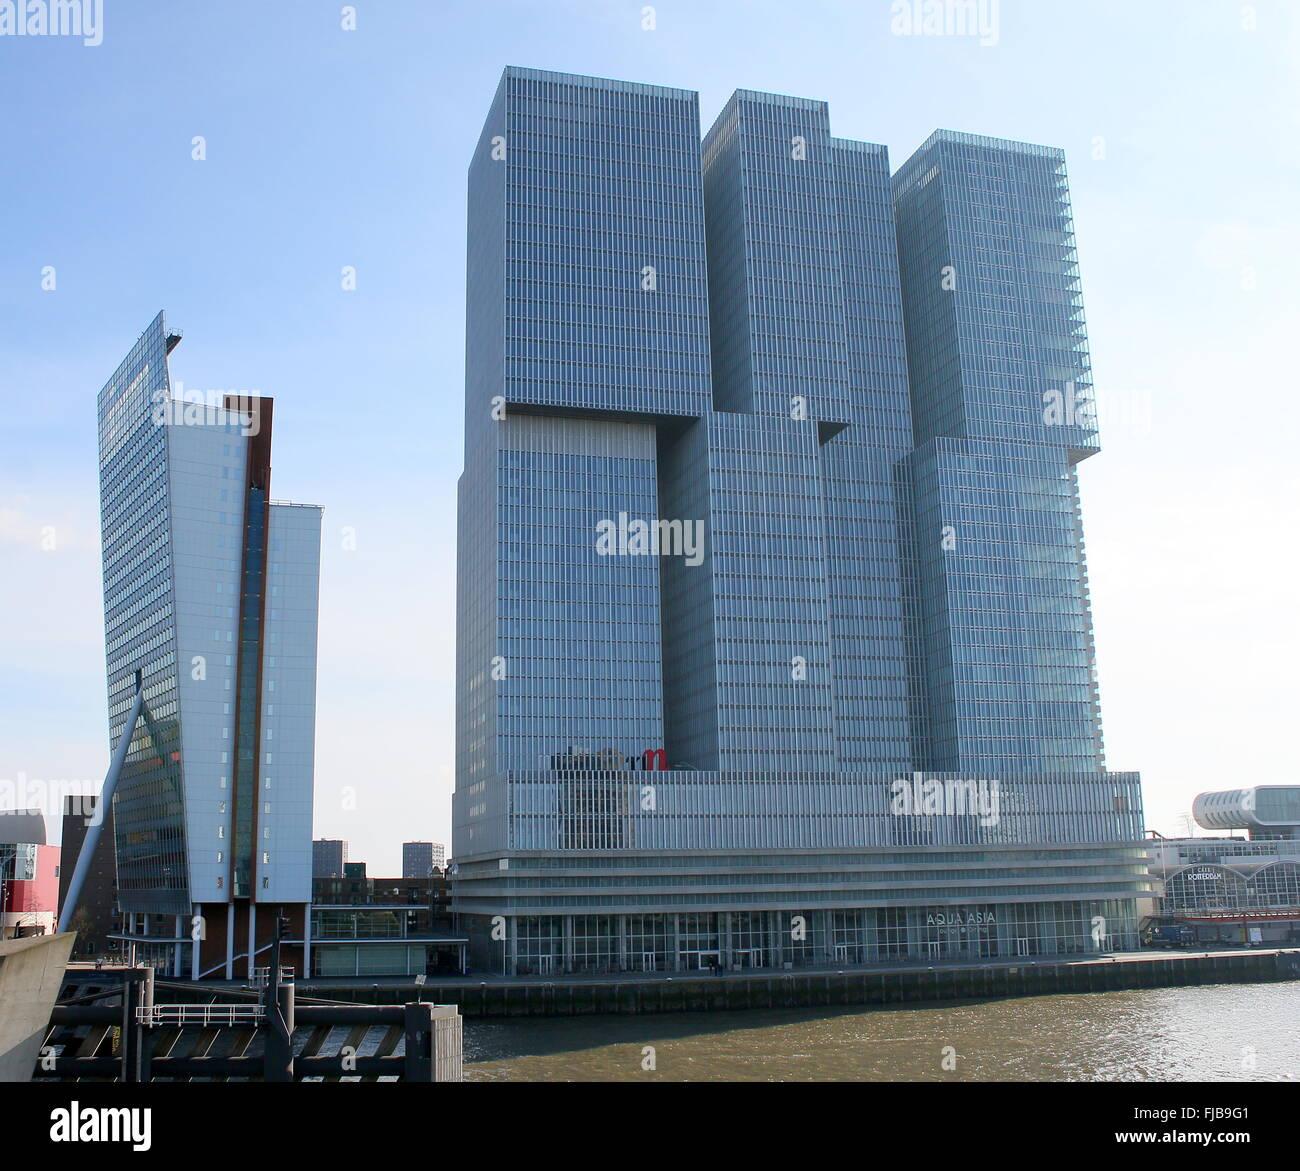 'De Rotterdam'  (2013) on Wilhelminapier in Rotterdam, design by Dutch architect  Rem Koolhaas, on left - Stock Image